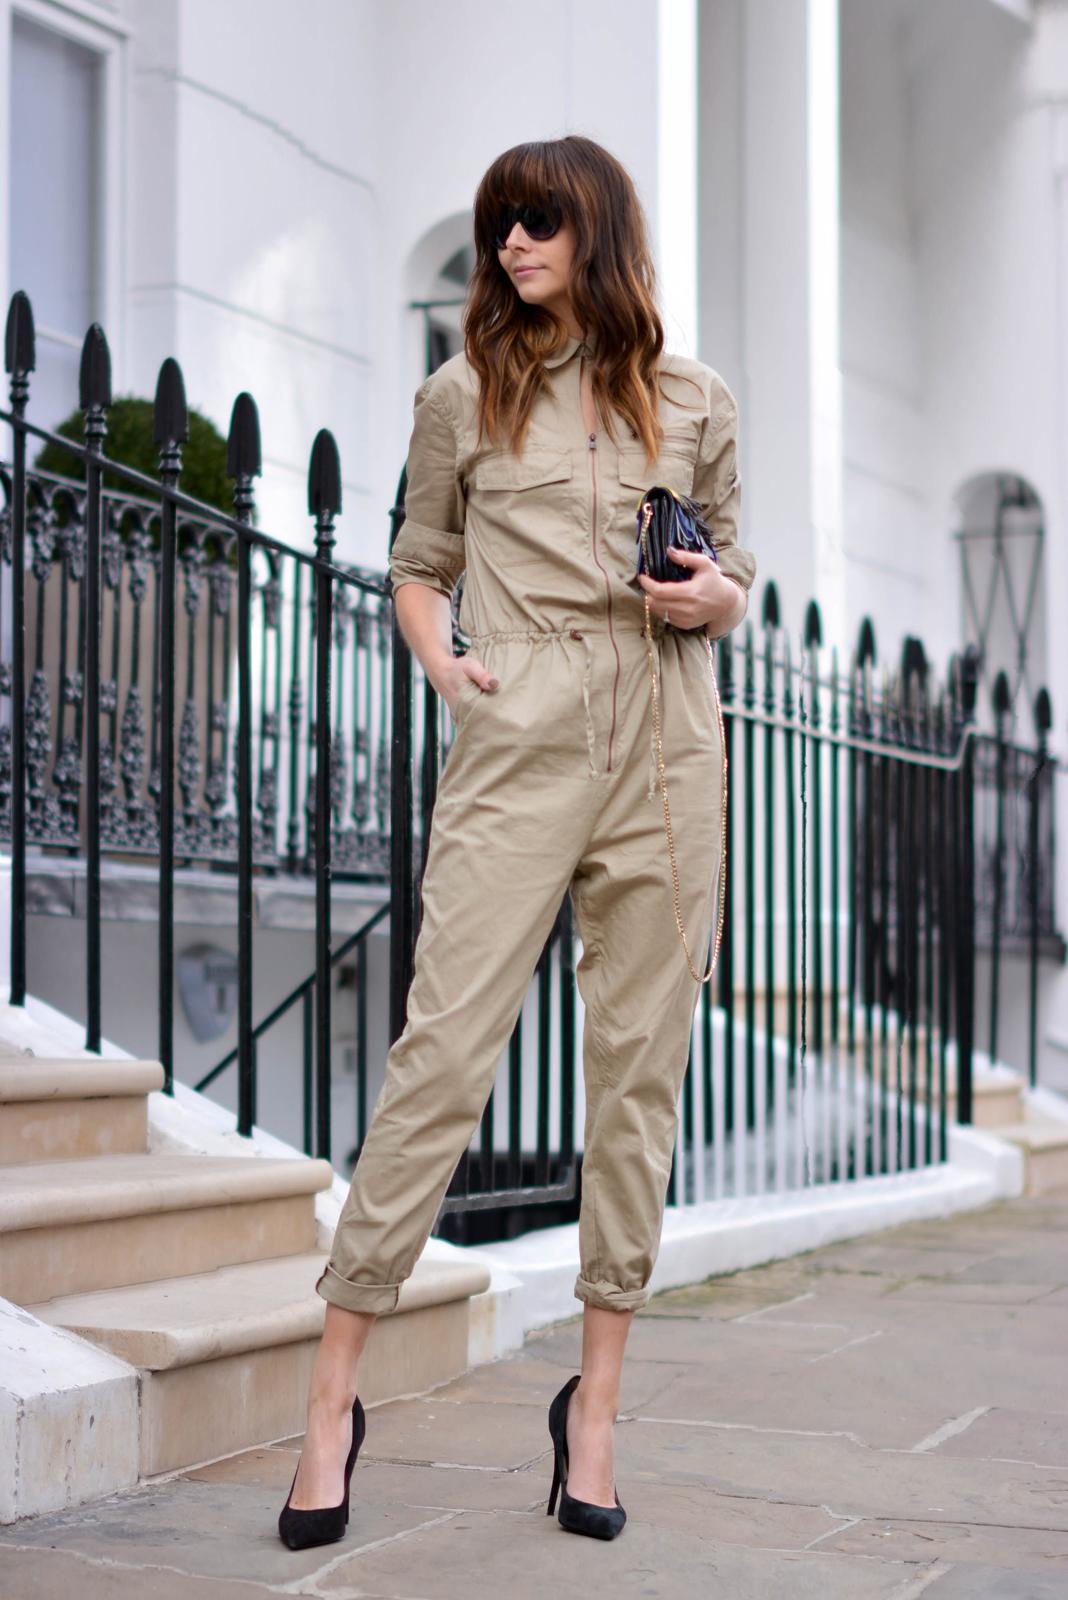 EJSTYLE - Emma Hill, H&M jumpsuit boilersuit, Jimmy Choo fringe Zadie bag, Zara black suede court shoes, OOTD, London Street style